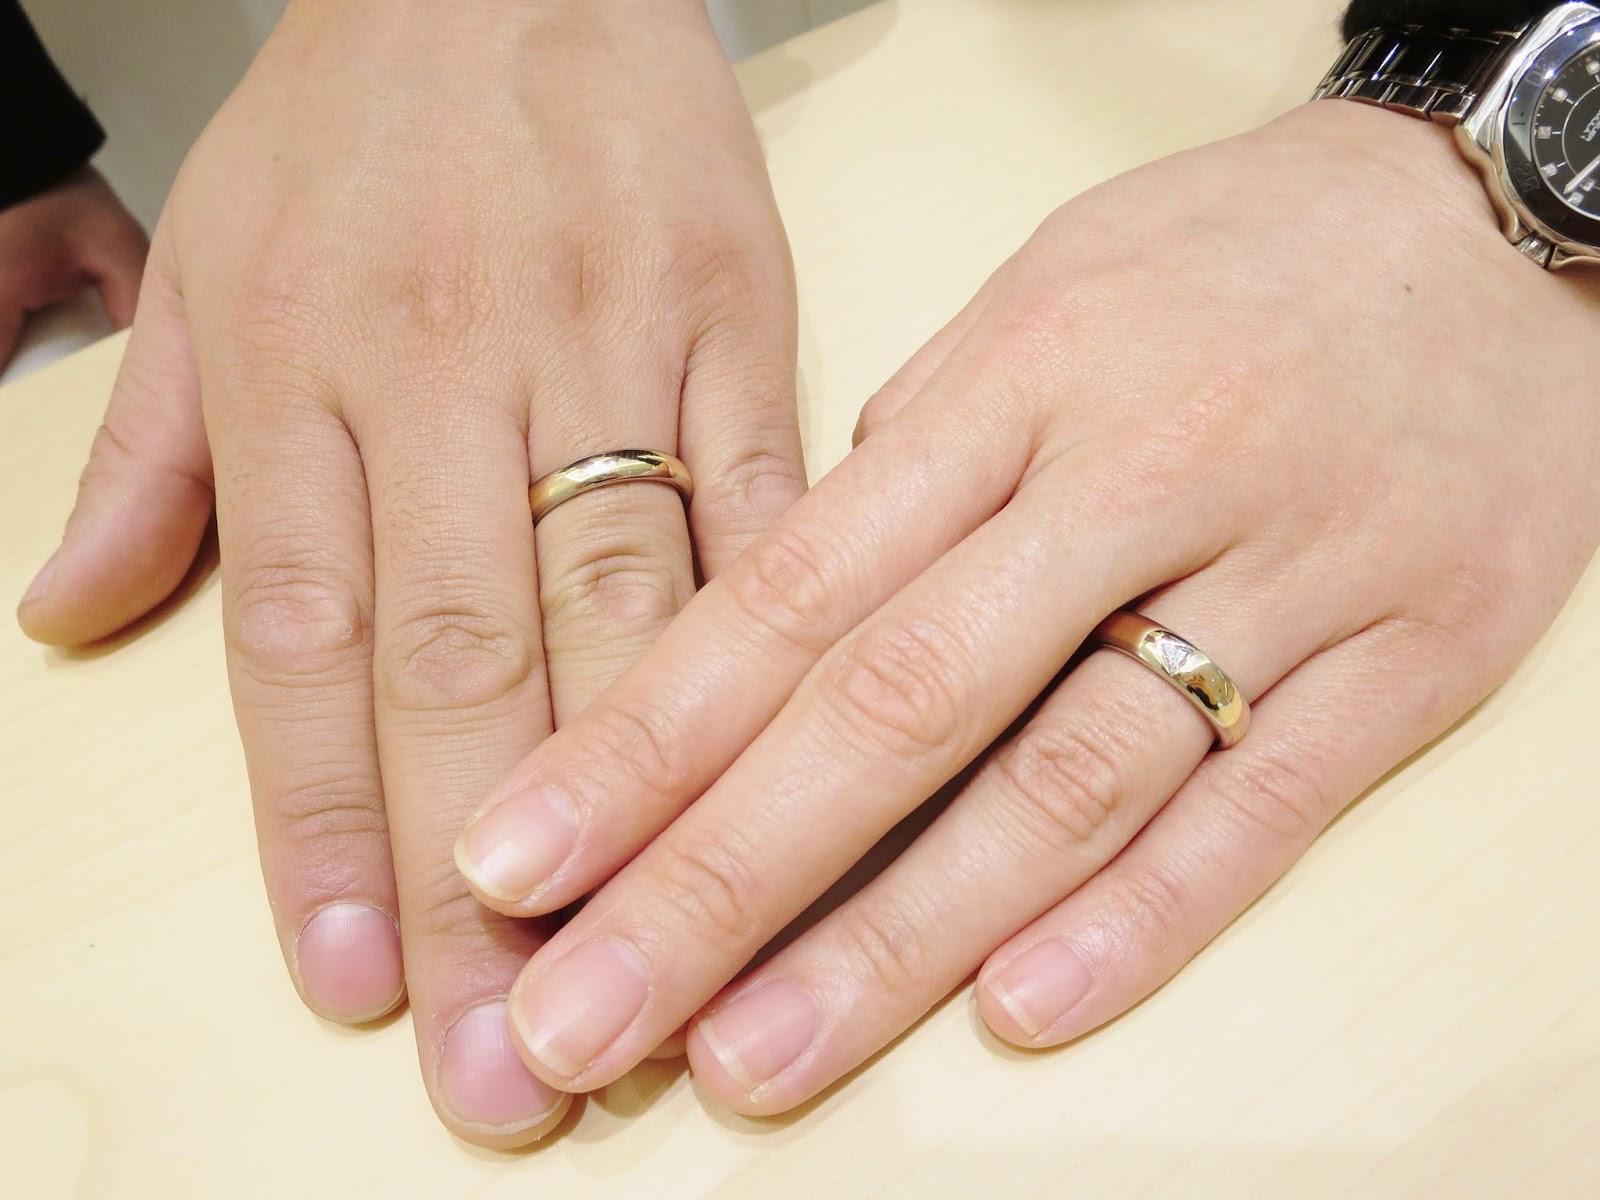 FURRER JACOT フラージャコー 名古屋 鍛造 スイス ゴールド 結婚指輪 鍛造 クオリティ